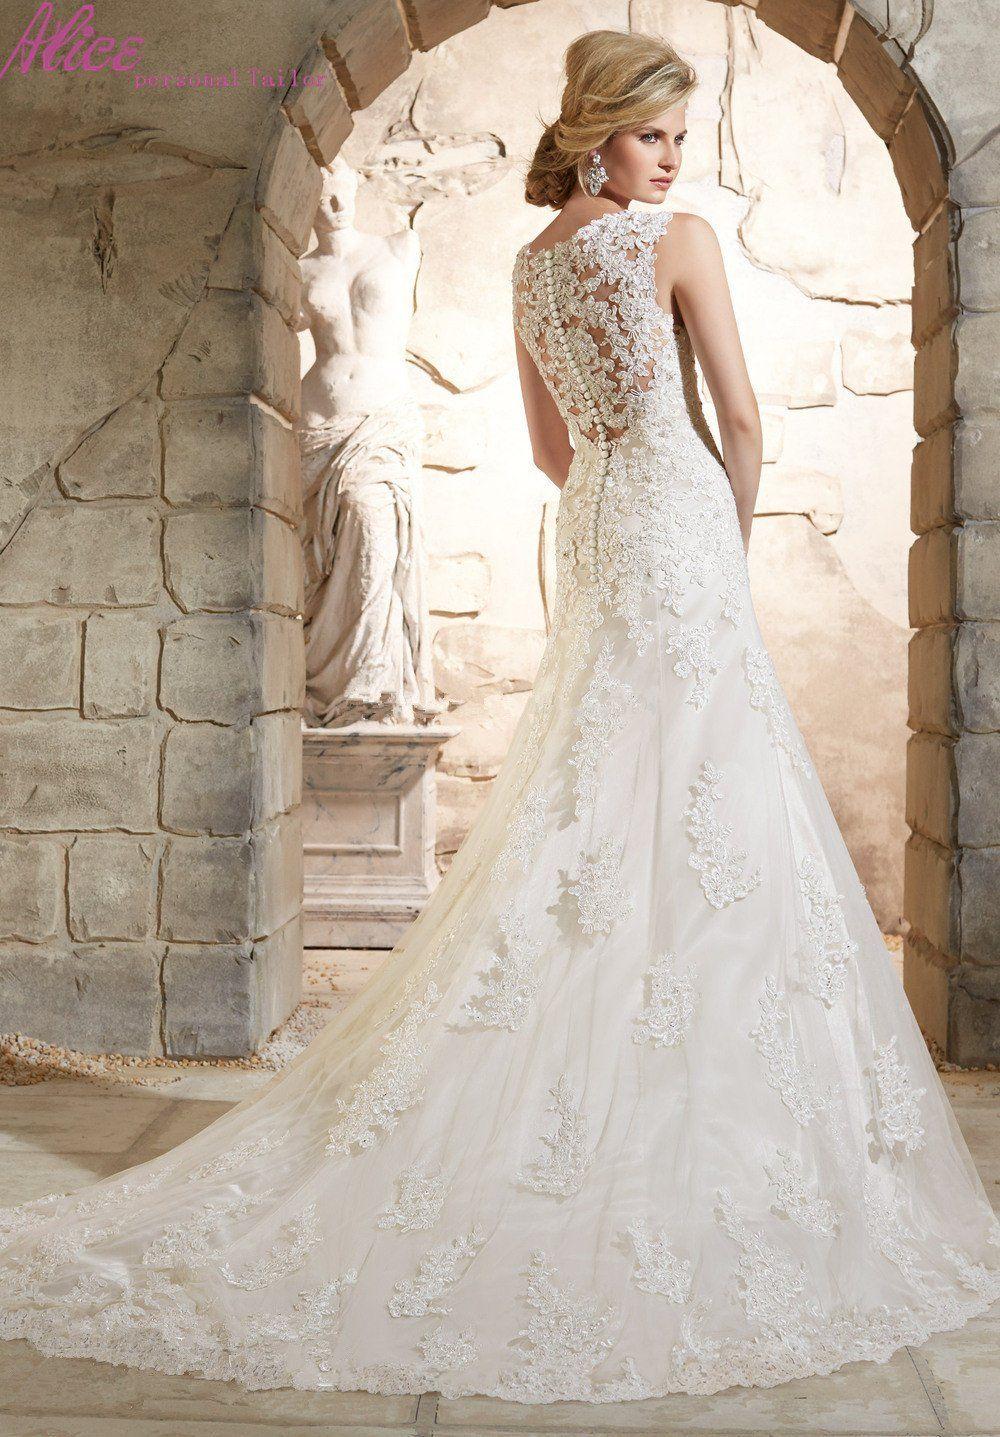 New arrival sheath lace wedding dress v neck cap sleeves long